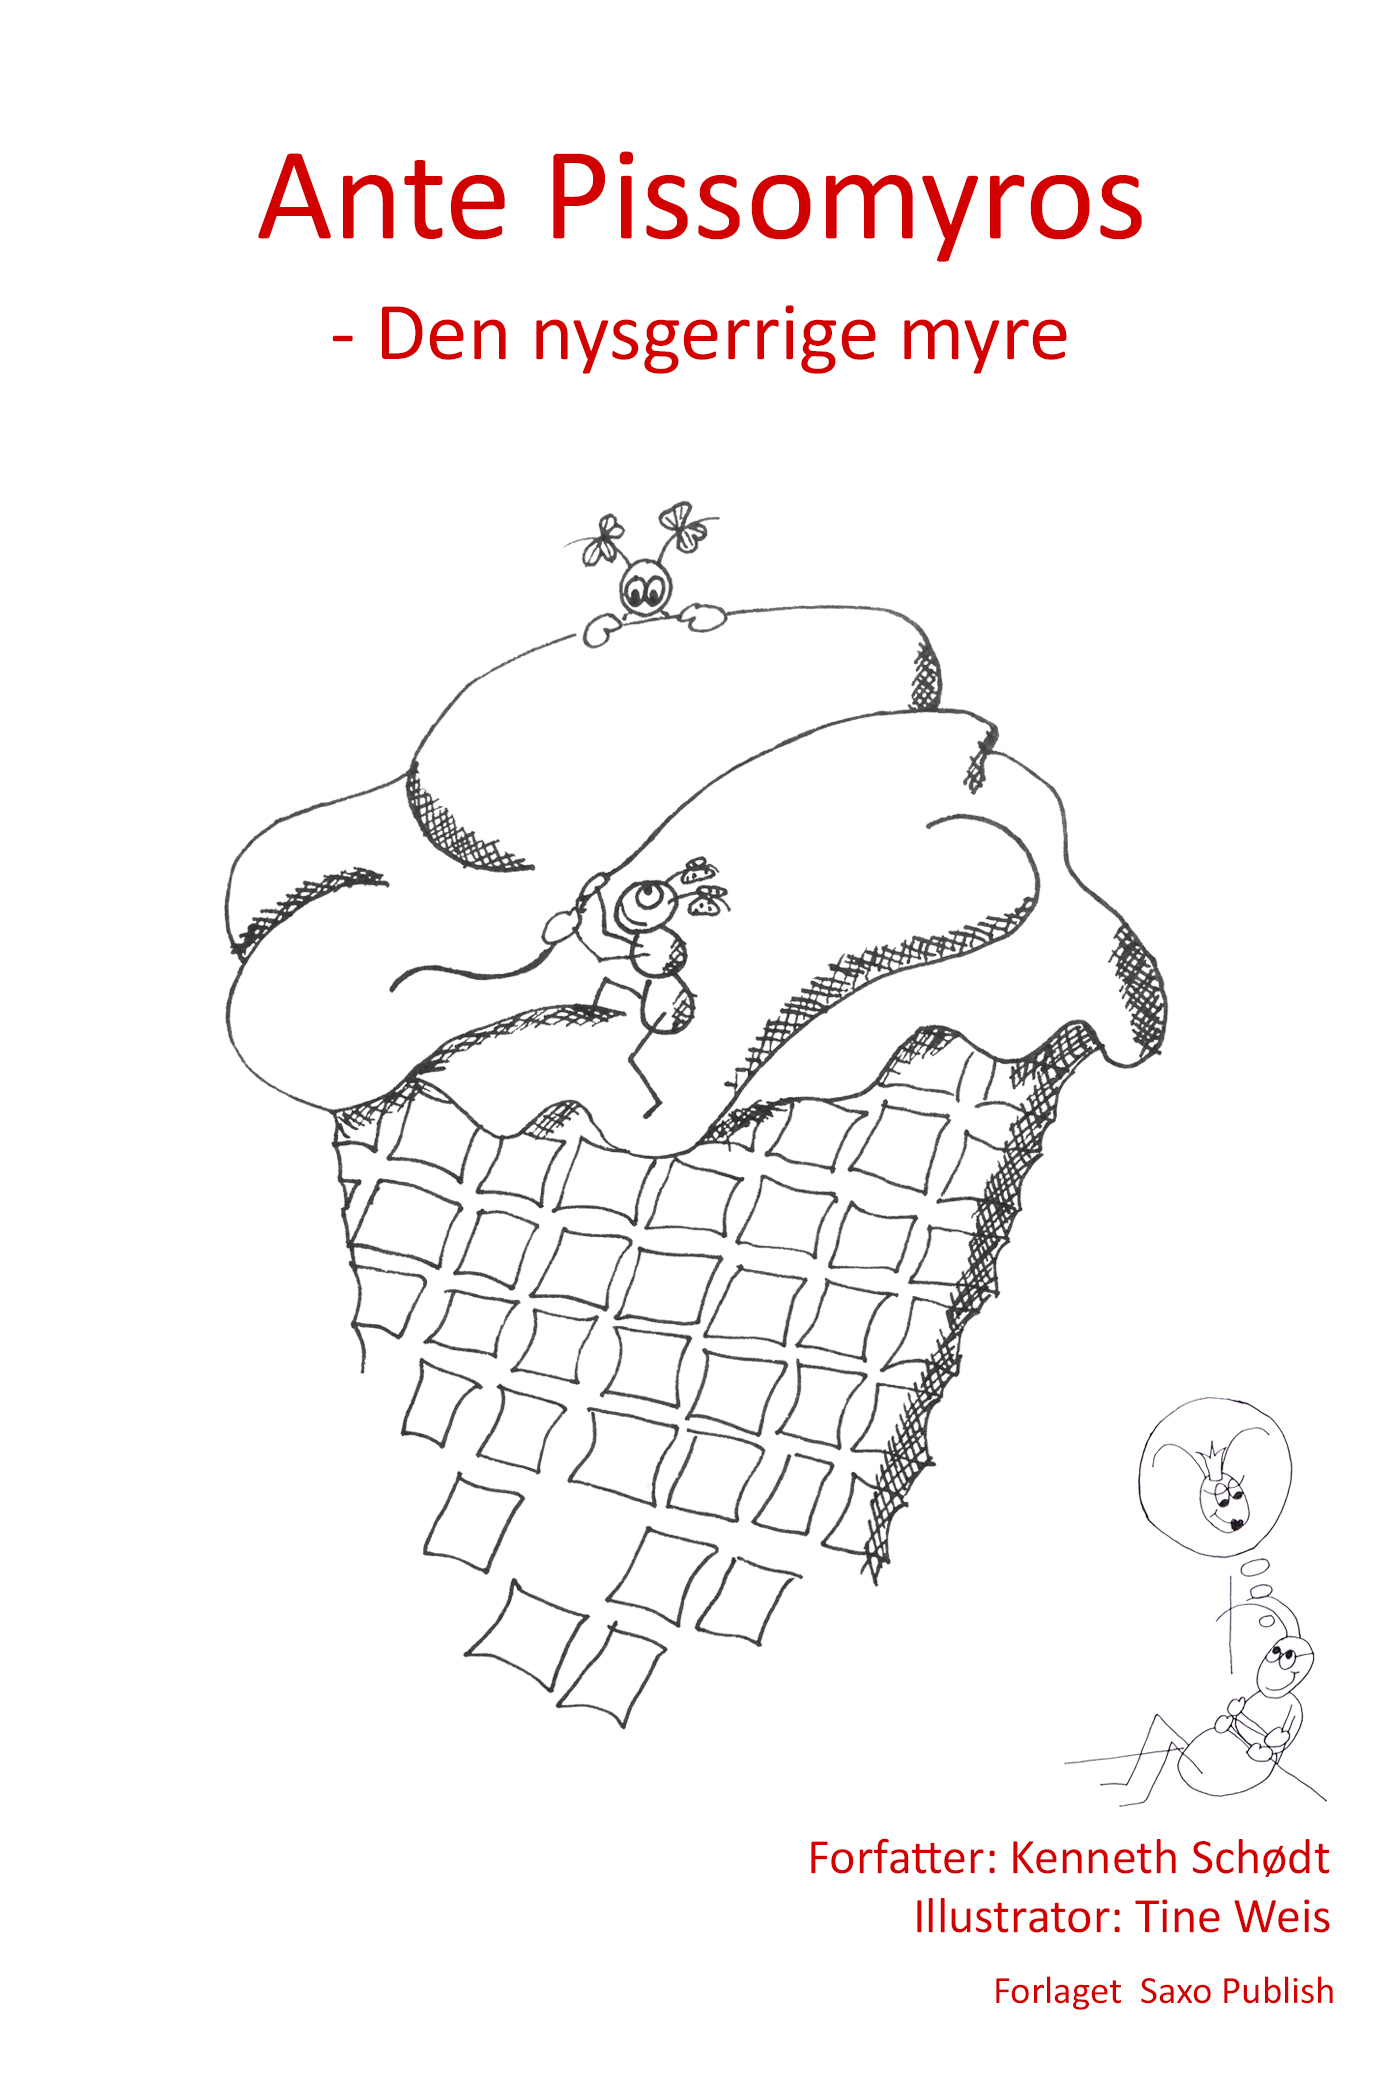 Ante pissomyros - den nysgerrige myre. - e-bog fra N/A på bog & mystik